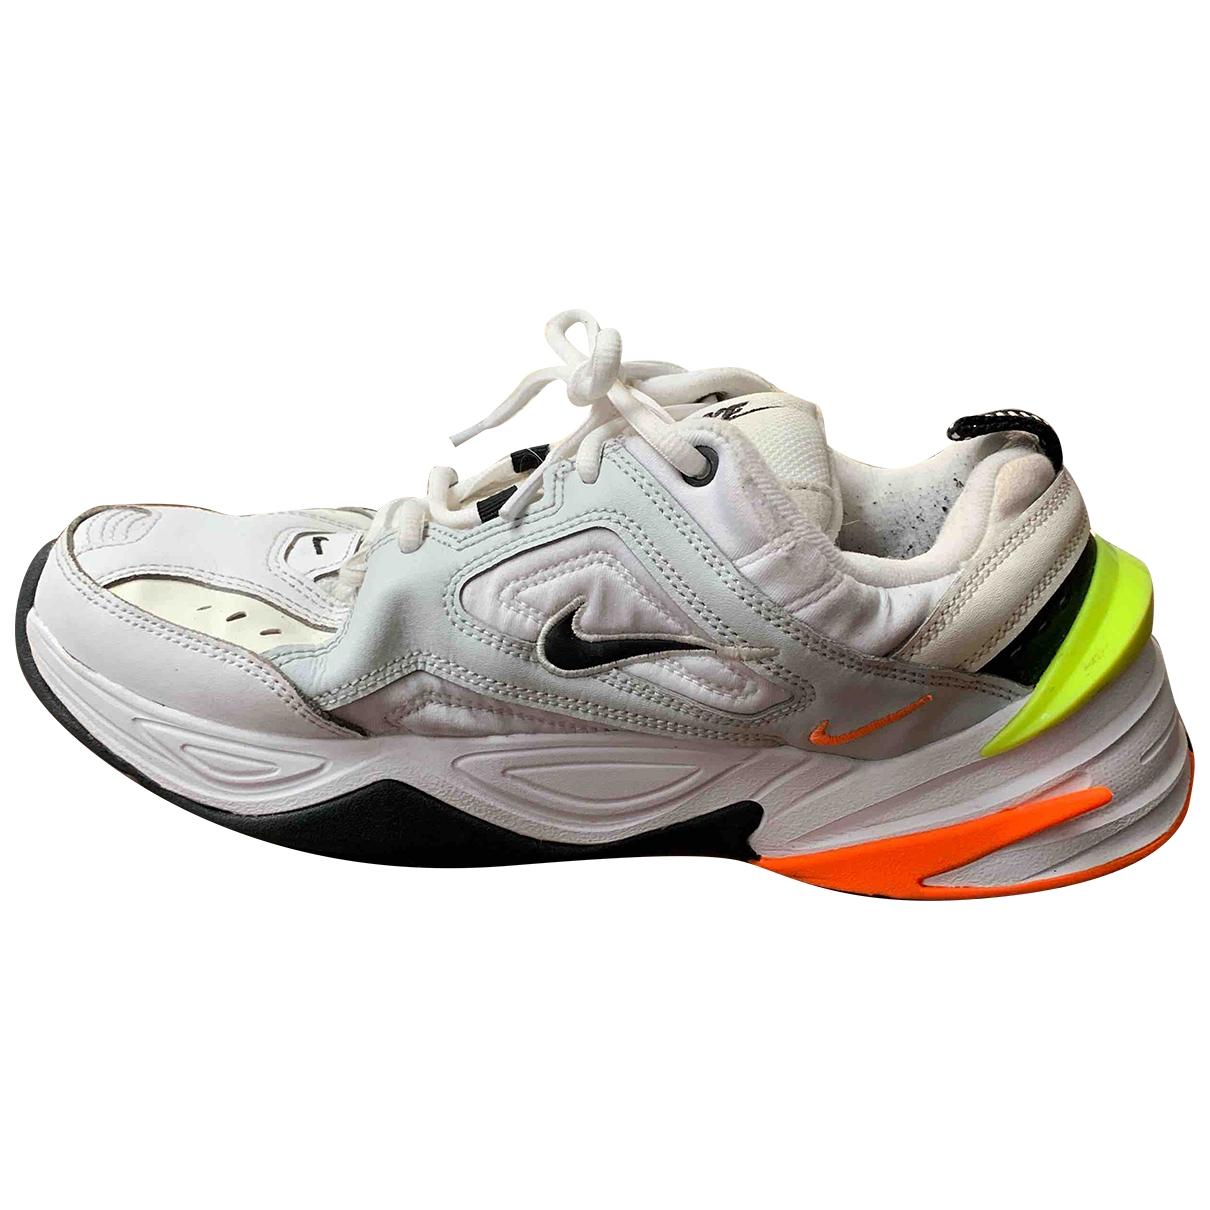 Nike M2K Tekno White Leather Trainers for Men 8 UK